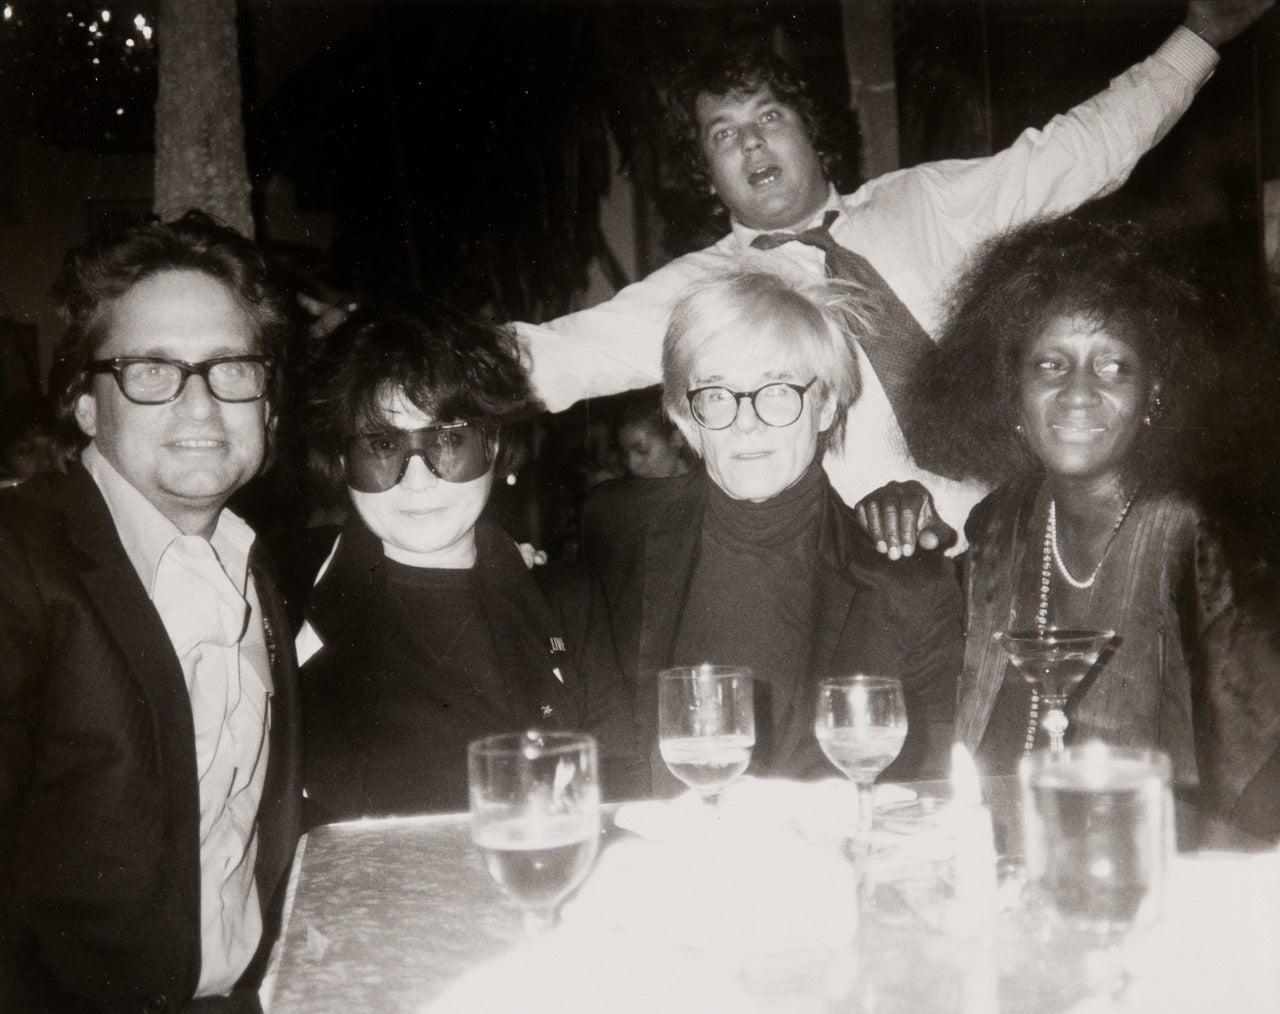 Andy Warhol, Michael Douglas, Yoko Ono, Jann Wenner, and Unidentified Woman - Photograph by Andy Warhol